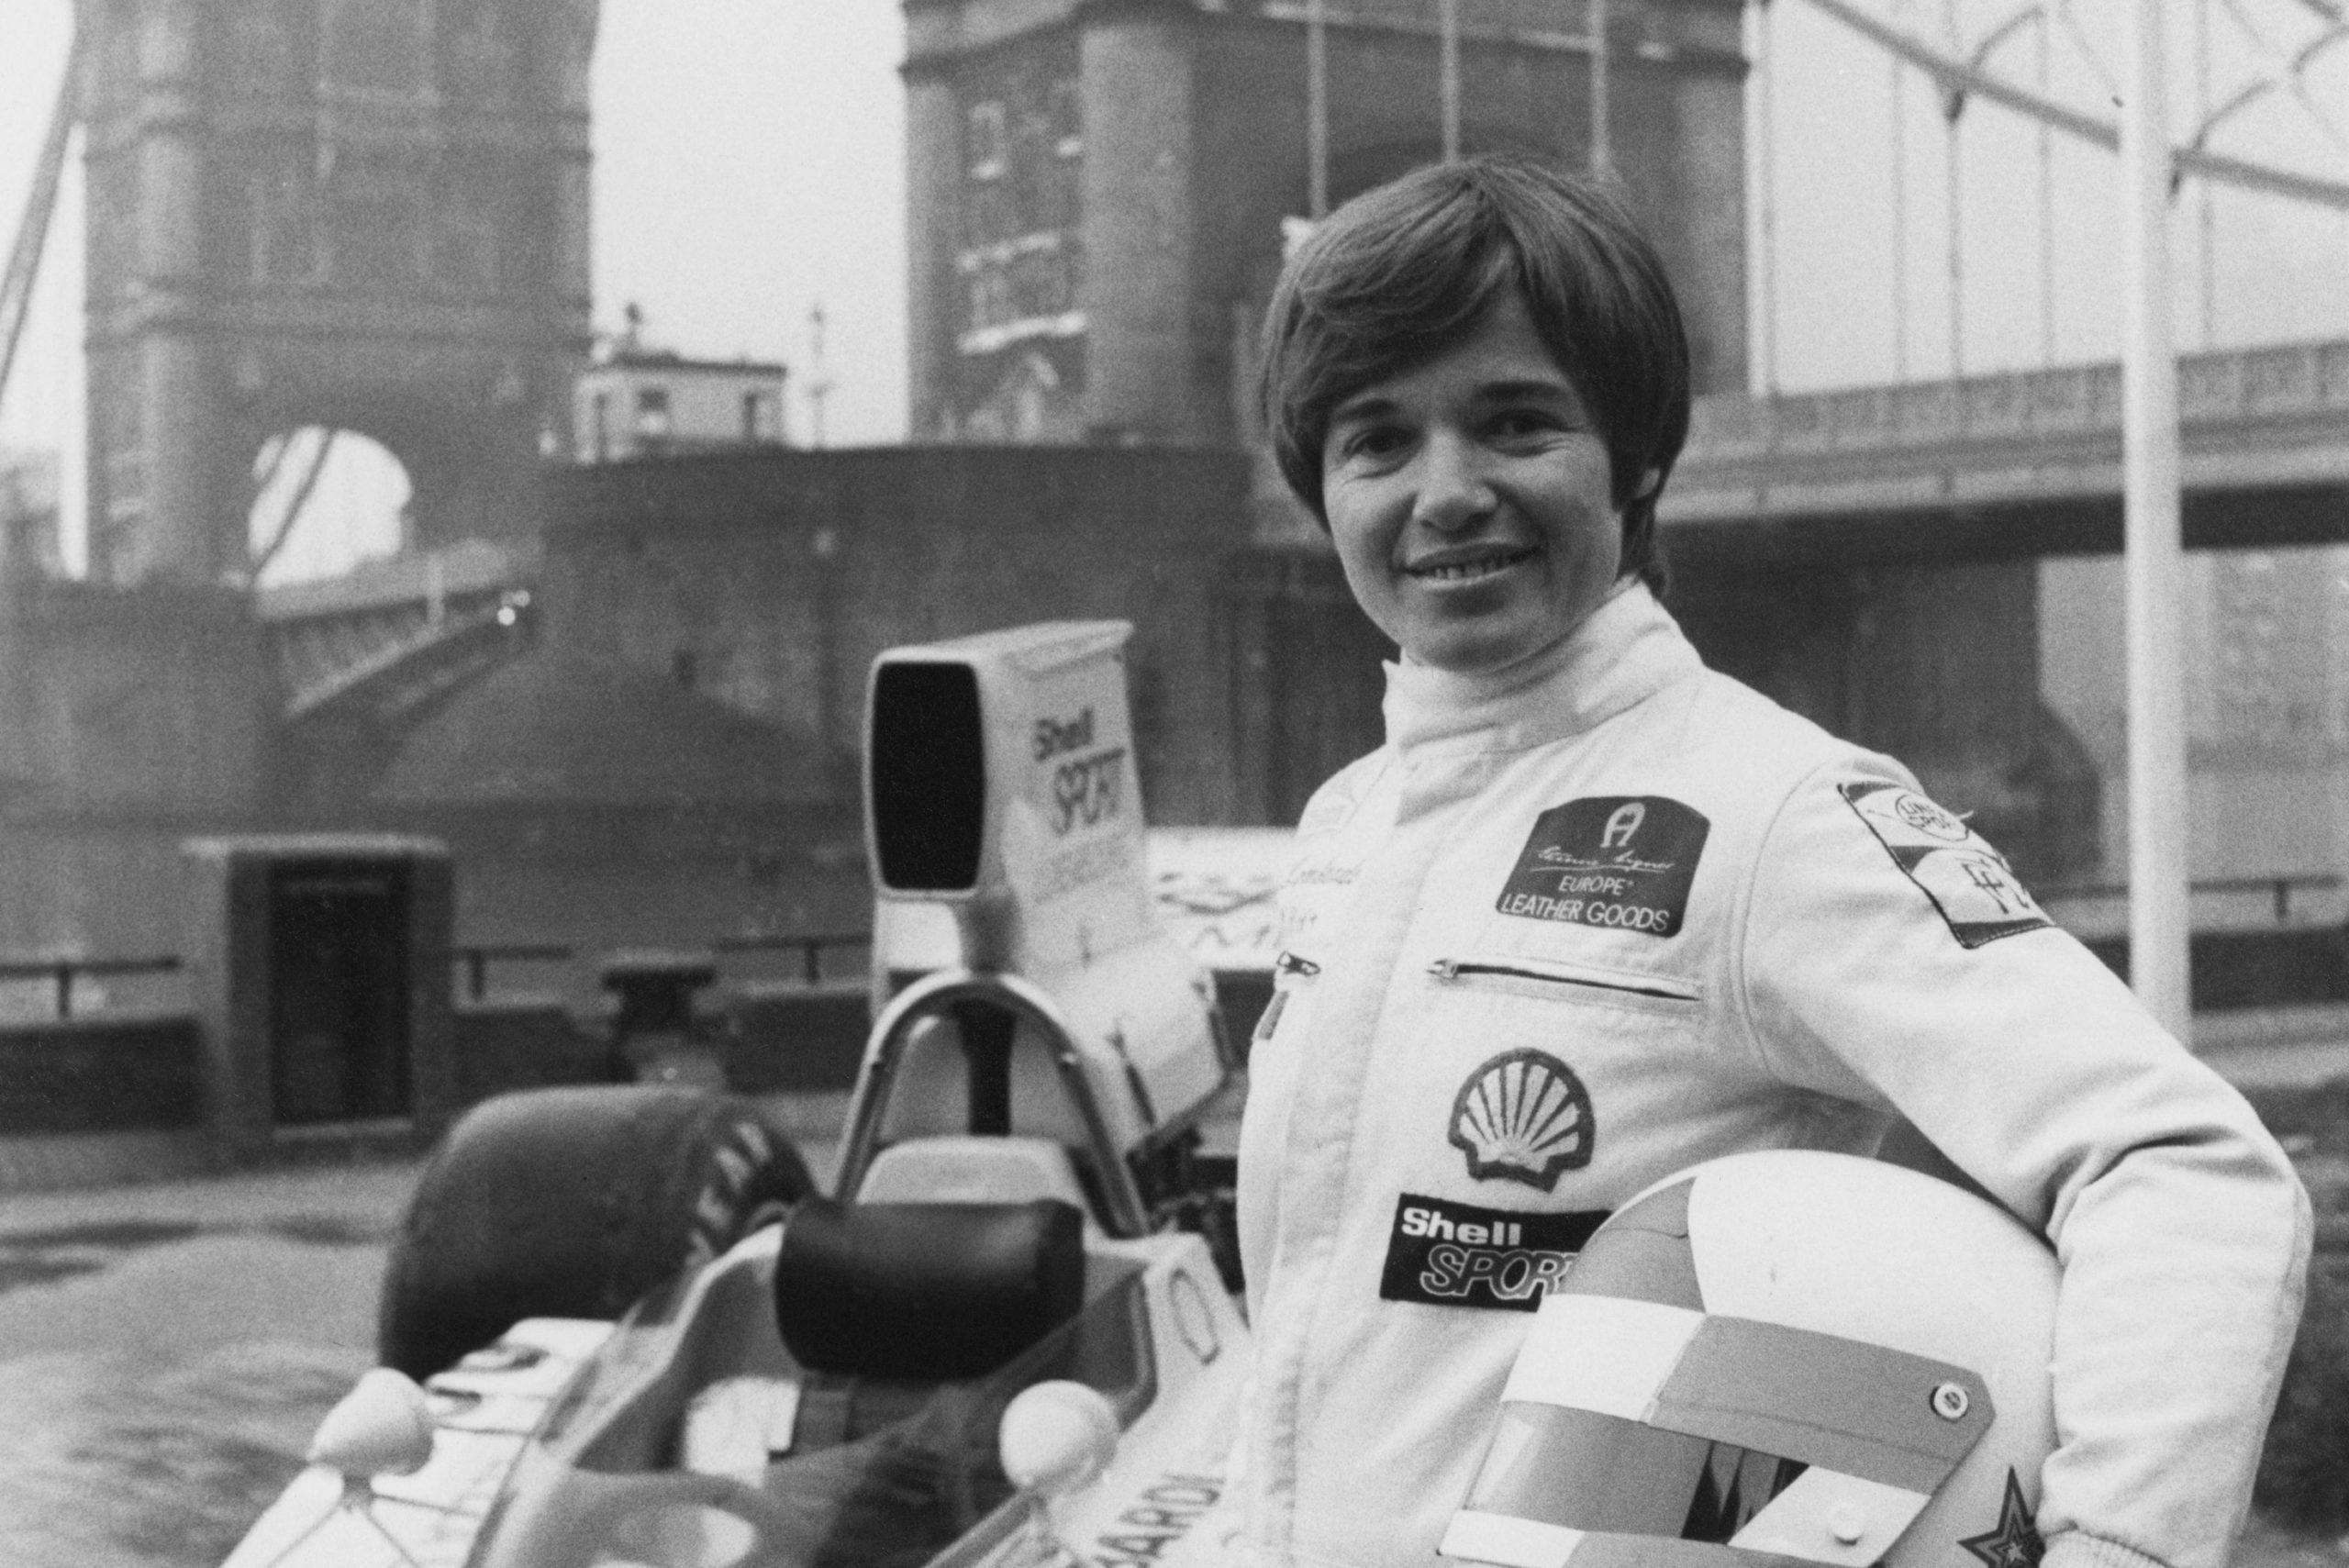 Lella Lombardi : la Femme 1 de la Formule 1